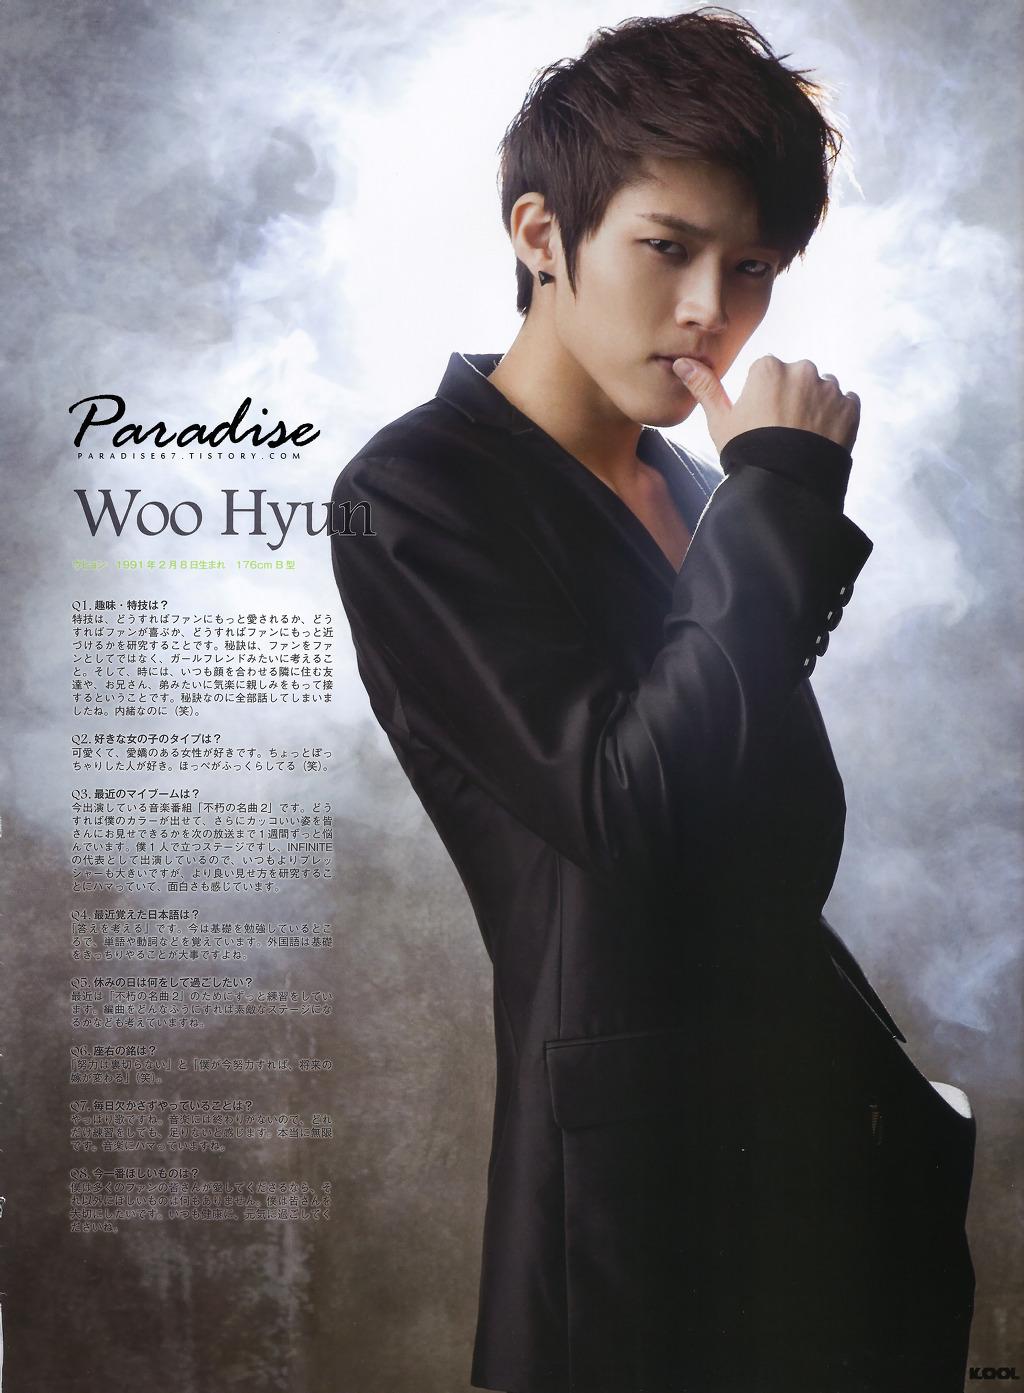 [2011.11.22] Entrevista Woohyun – Revista KOOL Kool11